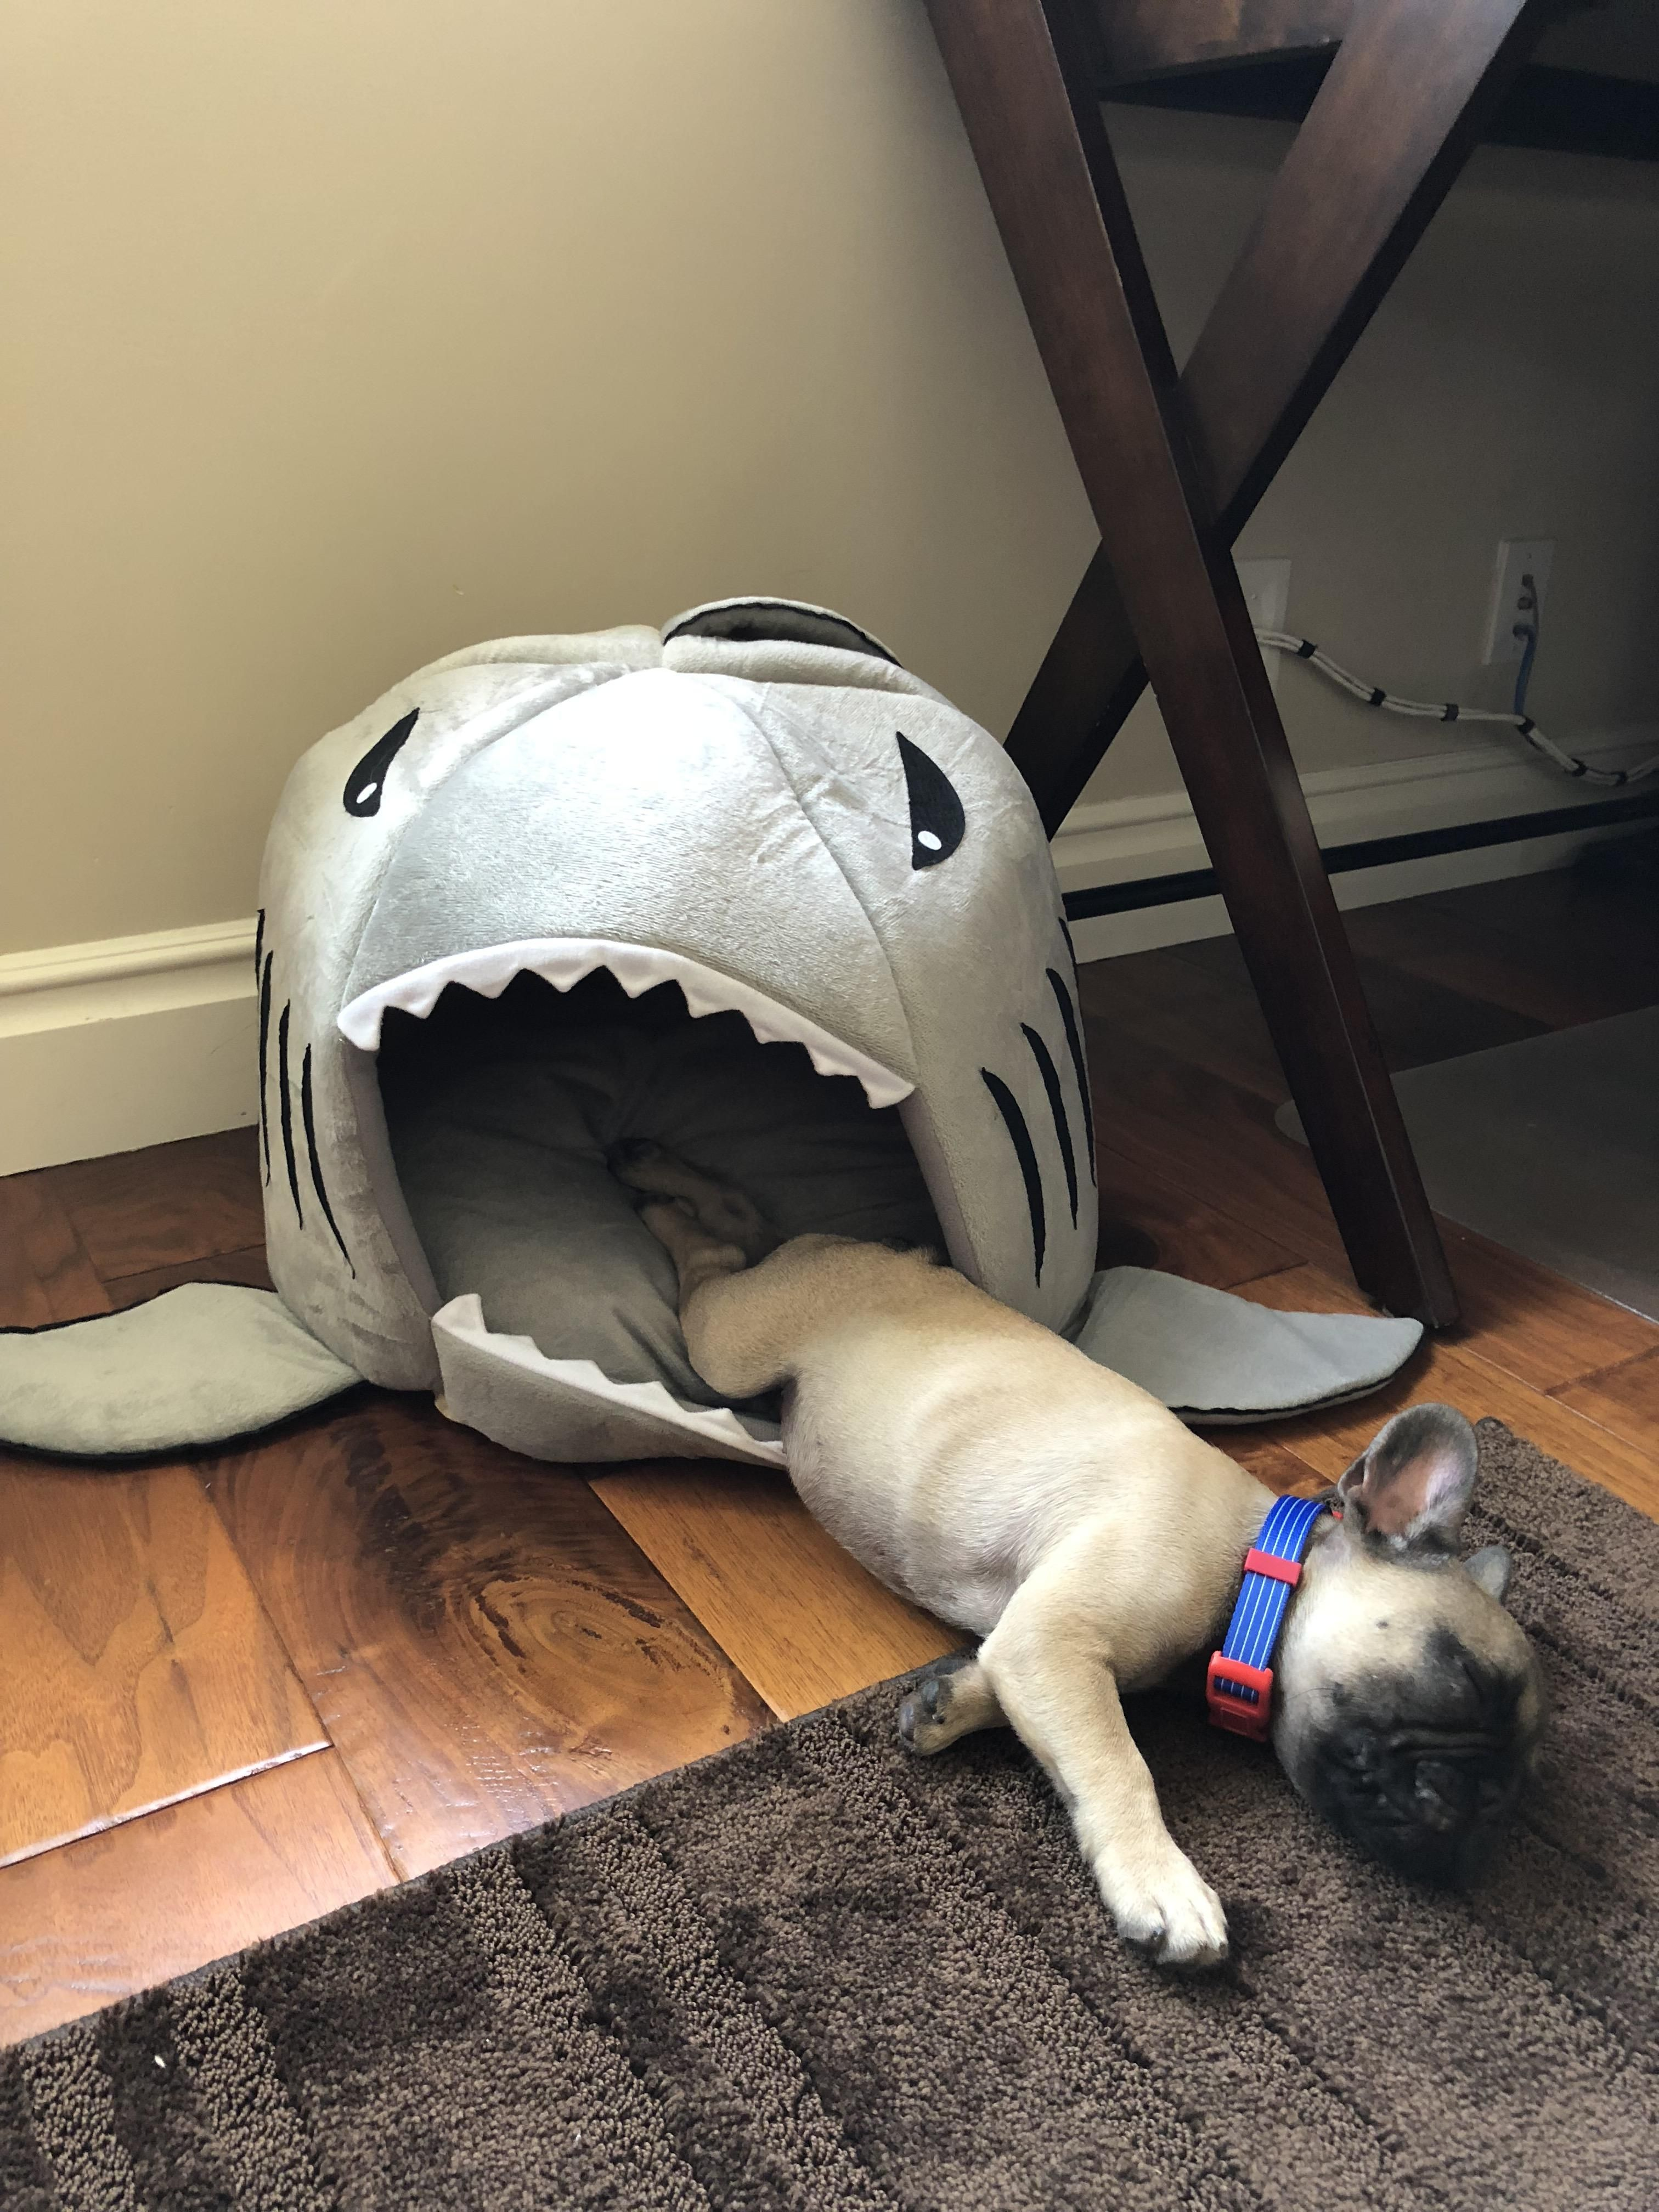 Hardcore henry barely survived shark attackiftpbqajv